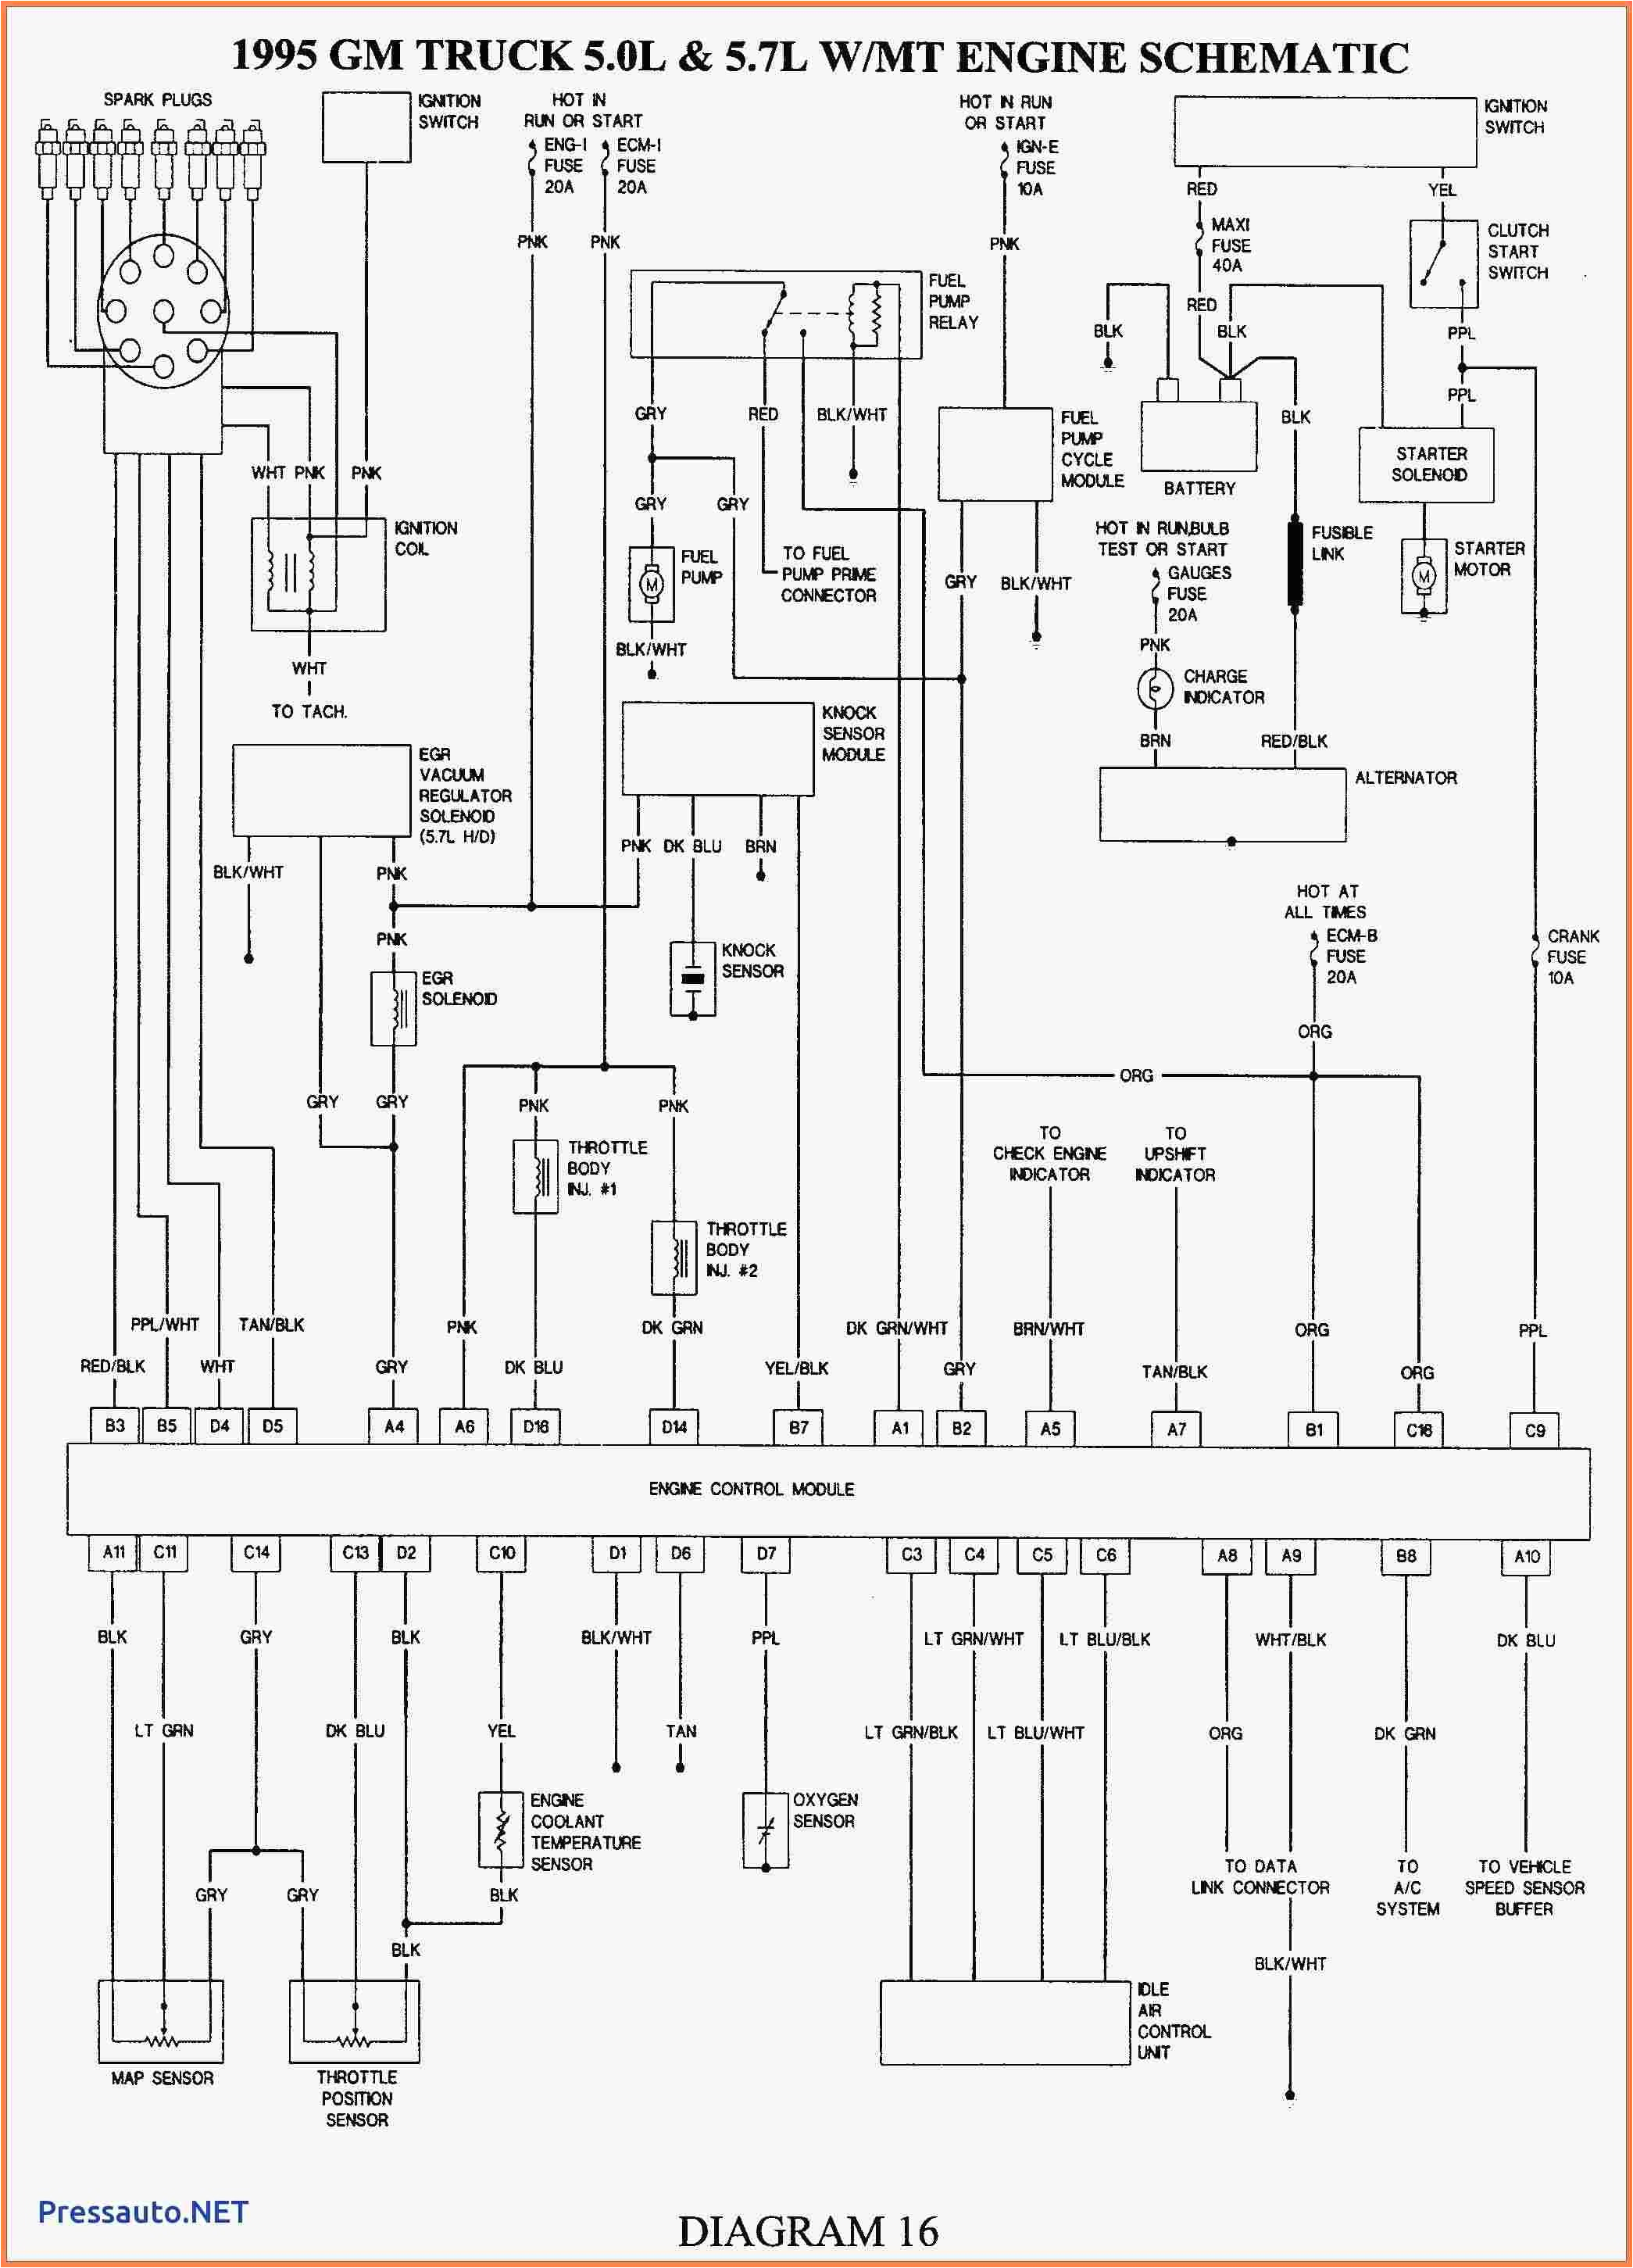 wiring diagram 2003 chevy silverado 1500 wiring diagram post 2003 chevy silverado 1500 parts wiring diagram